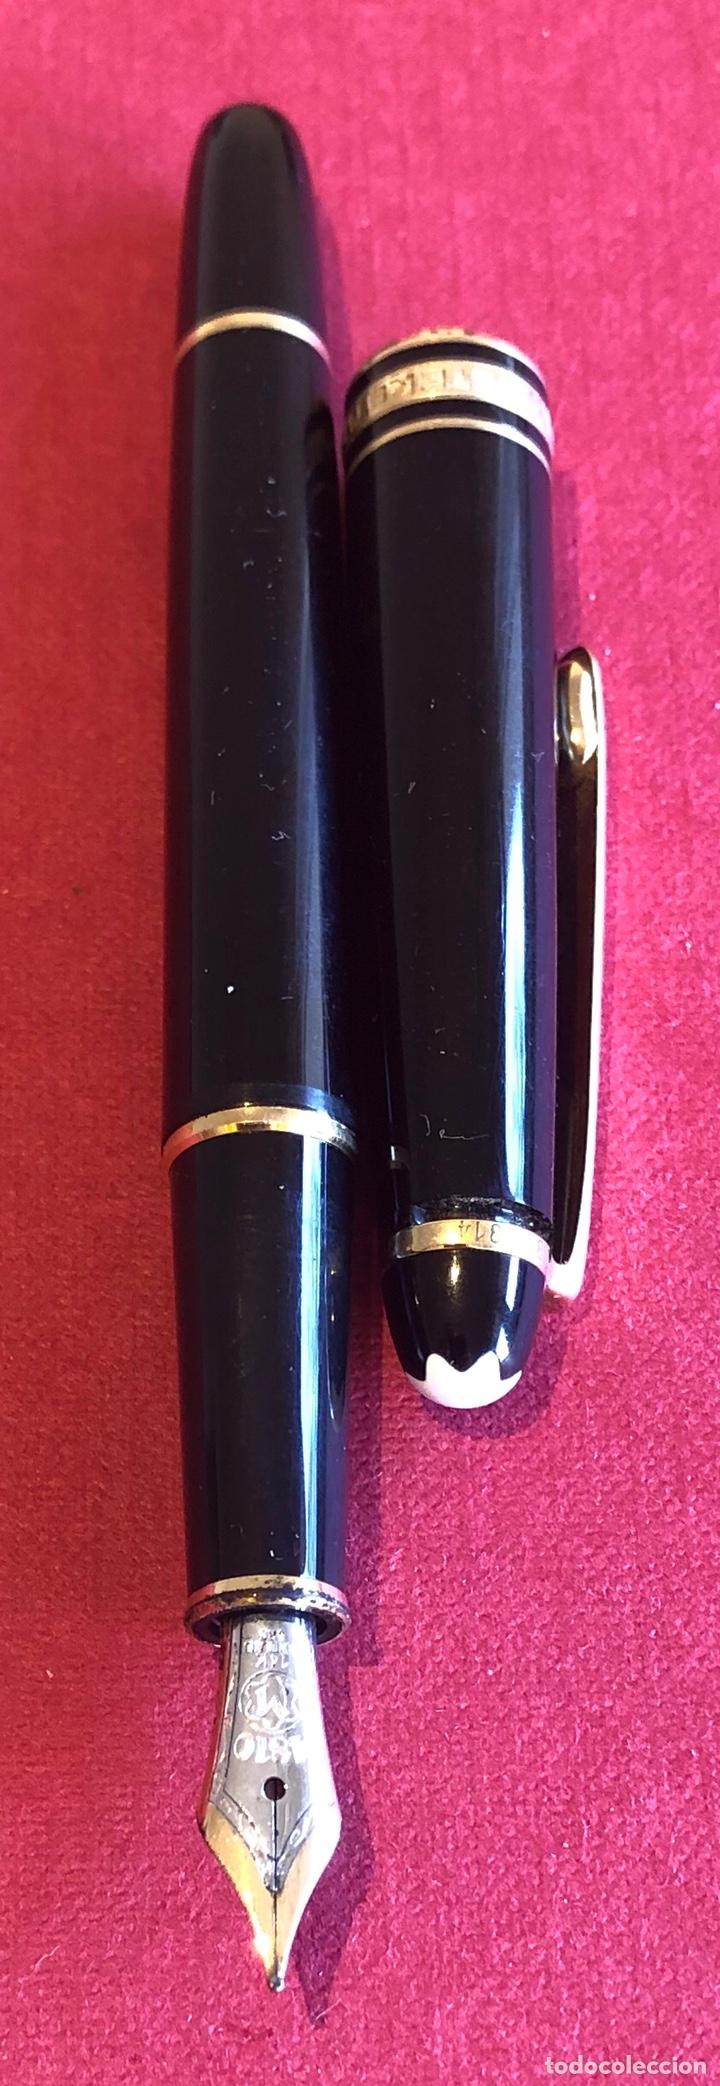 Plumas estilográficas antiguas: Pluma estilografica Montblanc Meisterstuck, de resina negra, con estuche original. - Foto 4 - 213380968